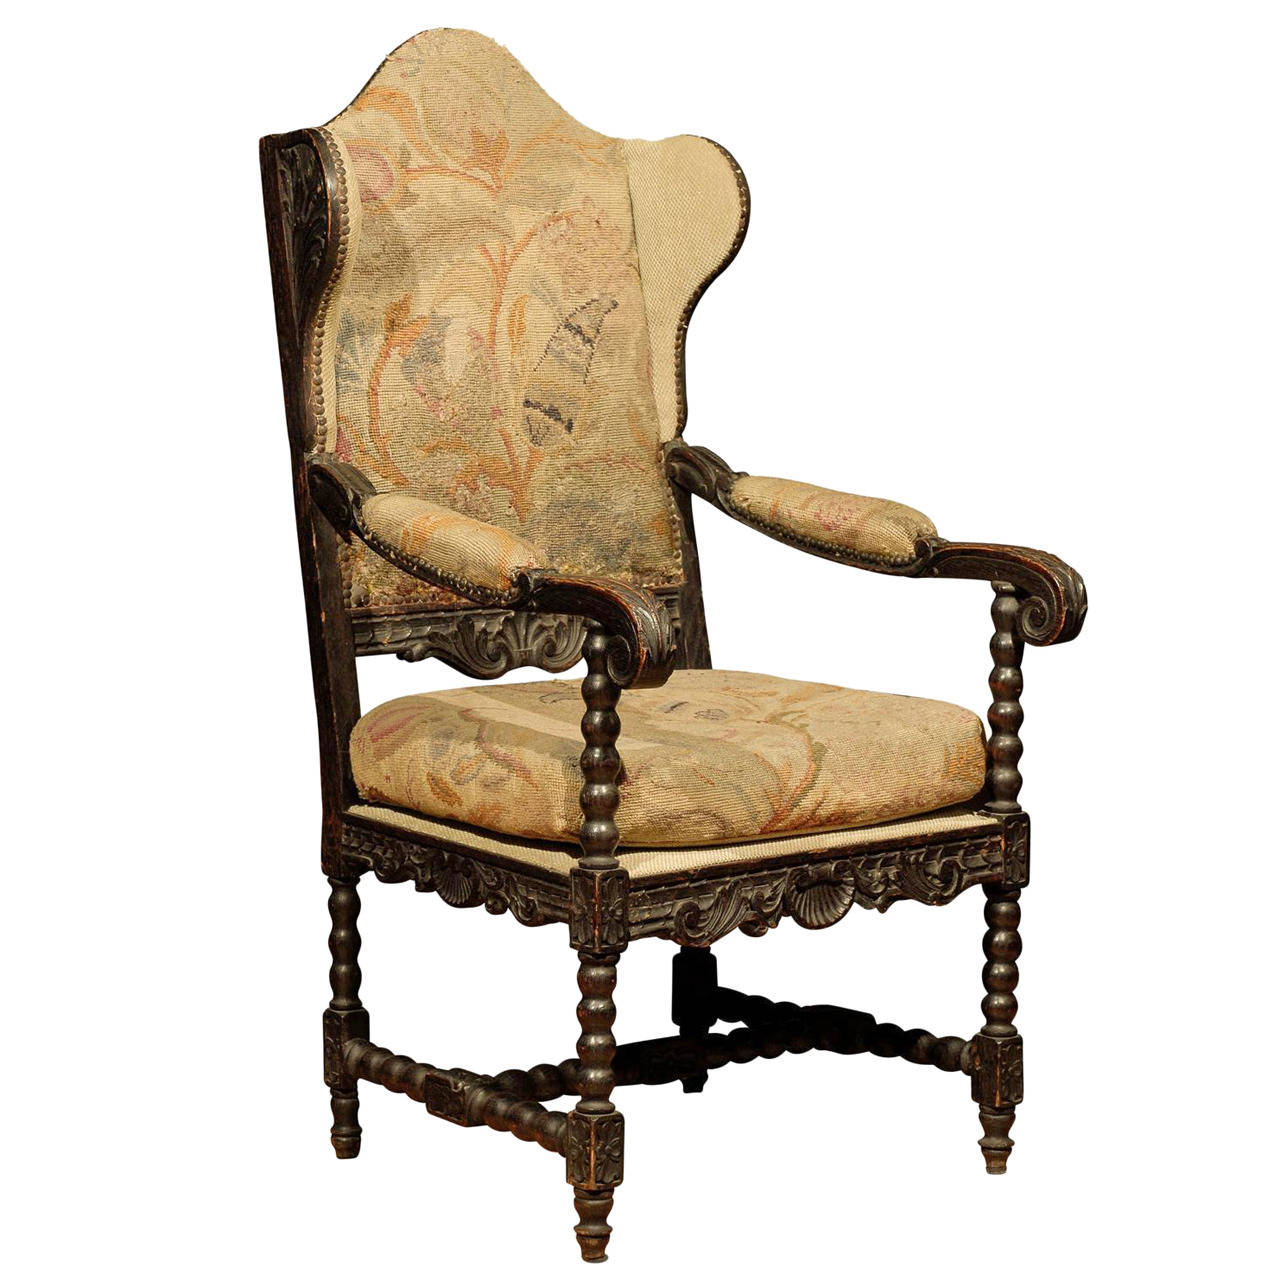 Darya girina interior design for English chair design